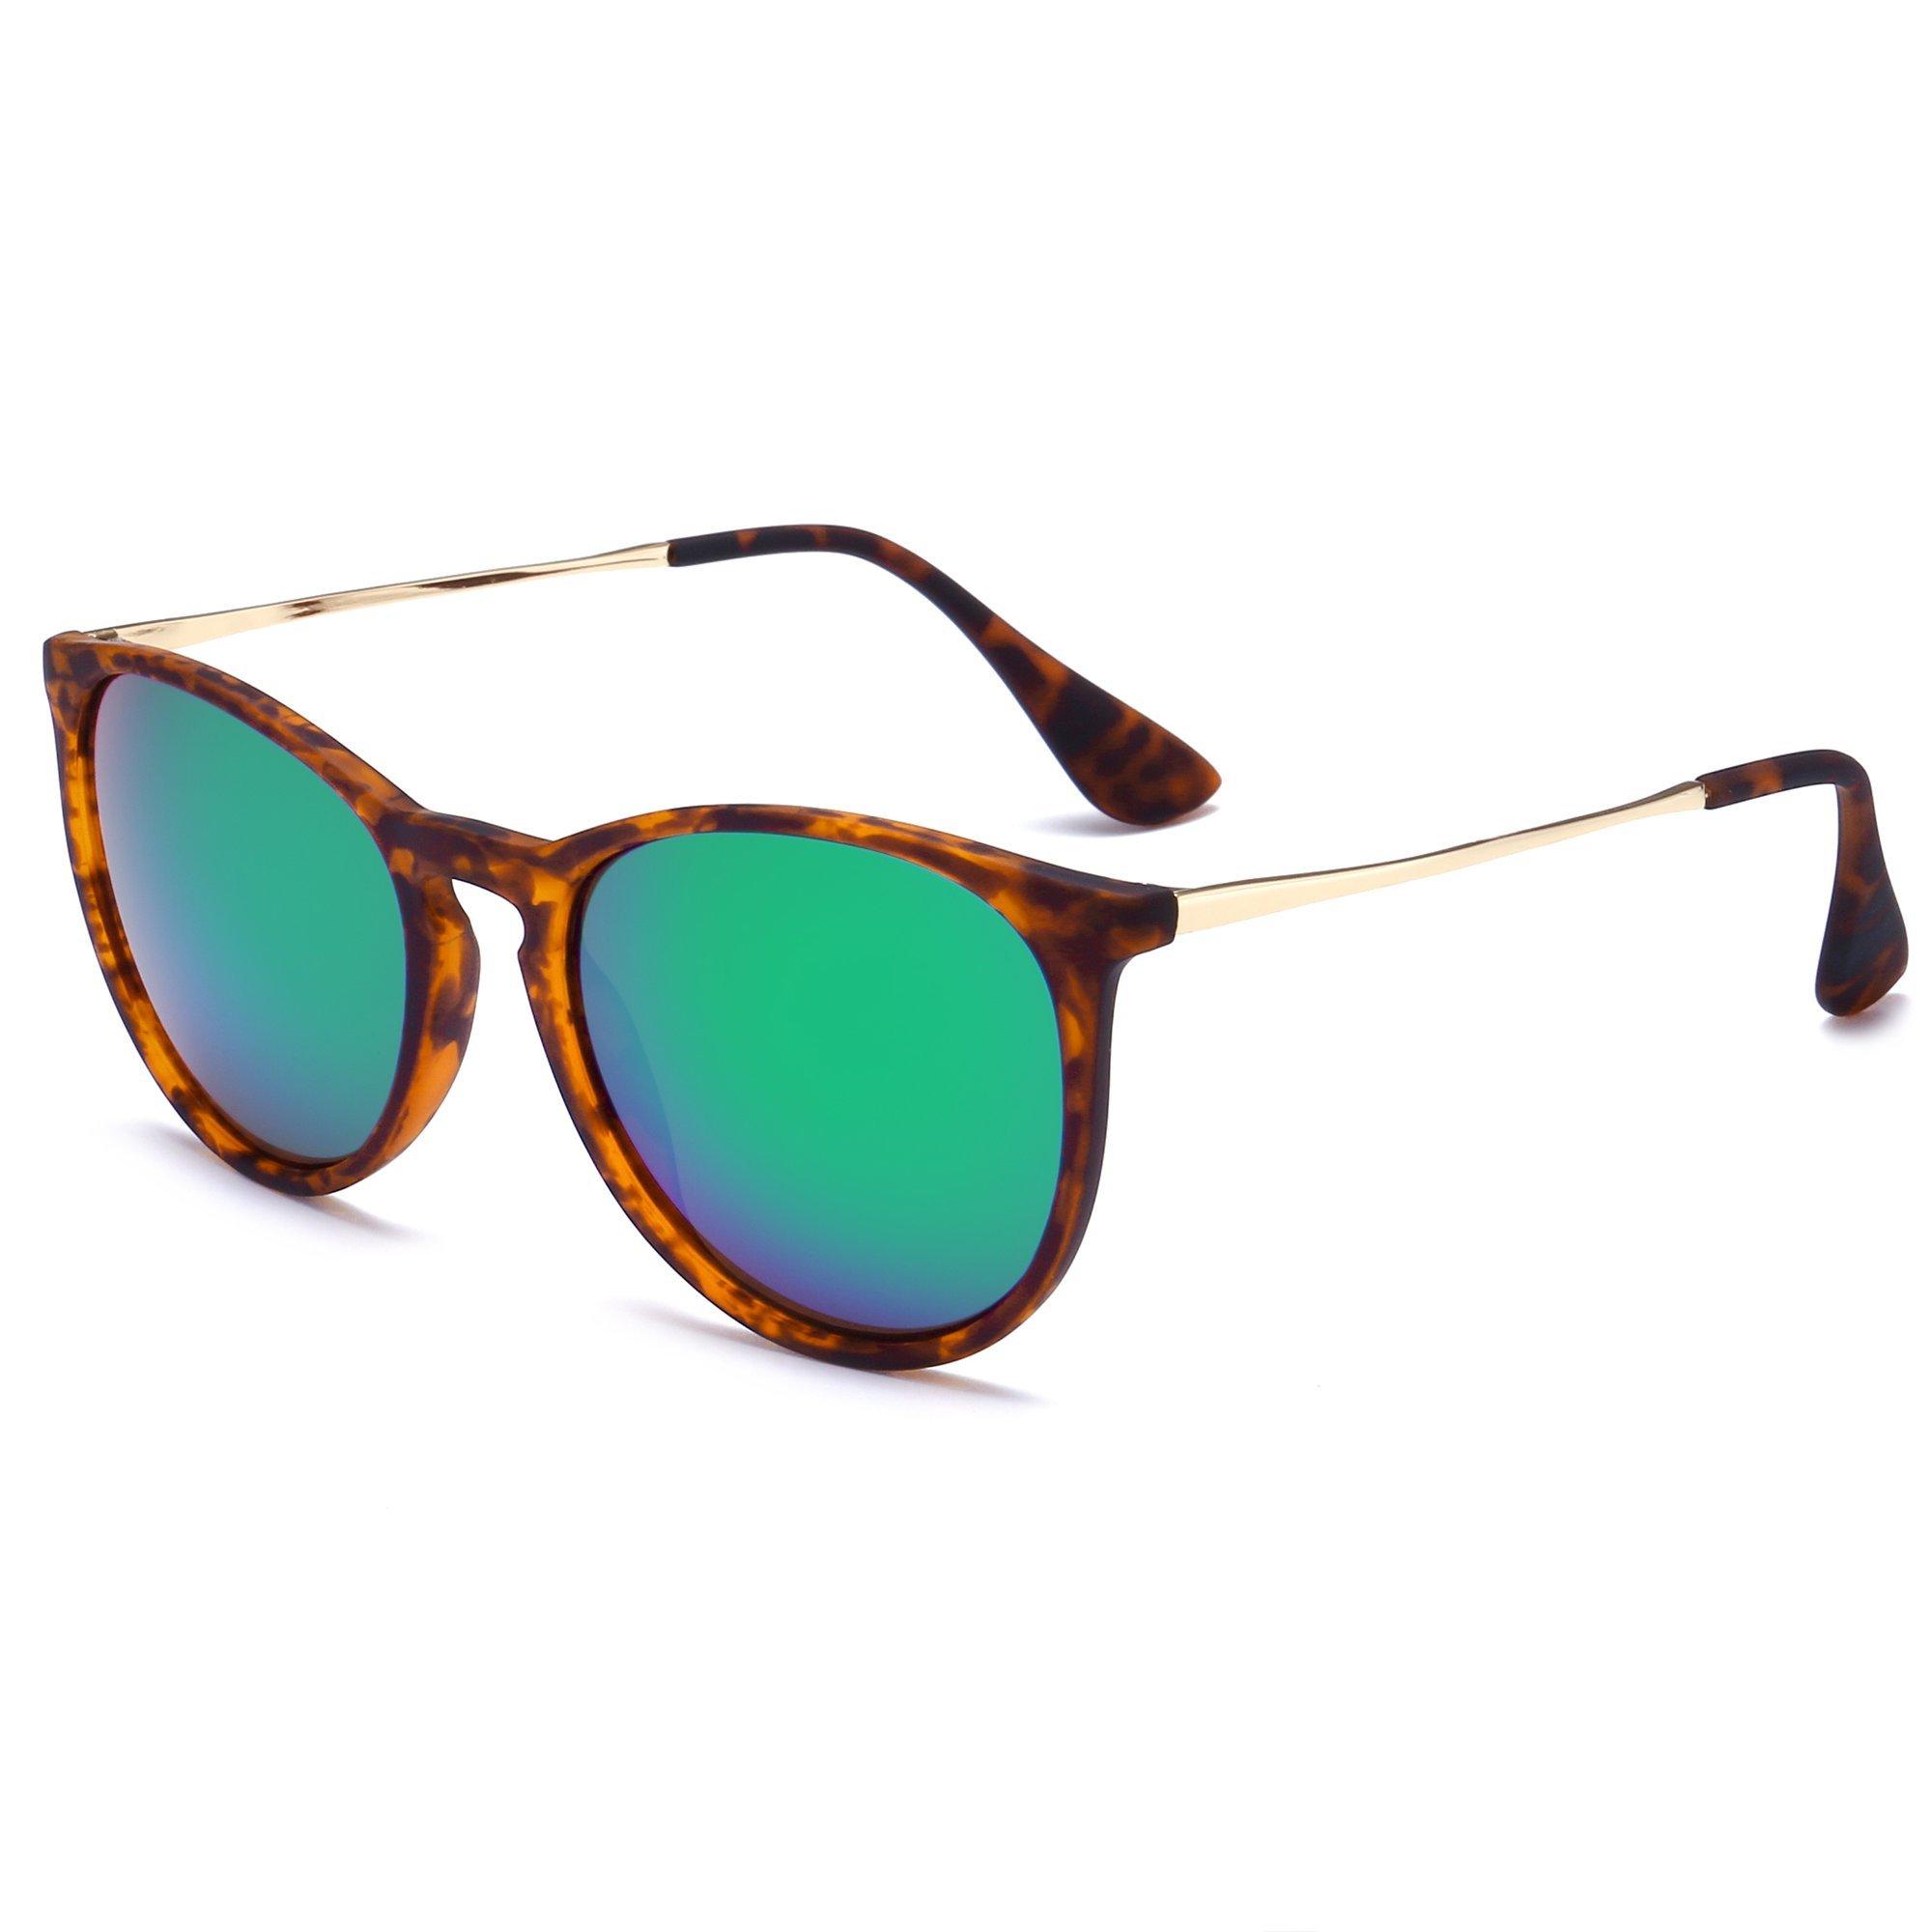 412fda84012 Details about SUNGAIT Vintage Round Sunglasses for Women Erika Retro Style  (Amber Frame Green